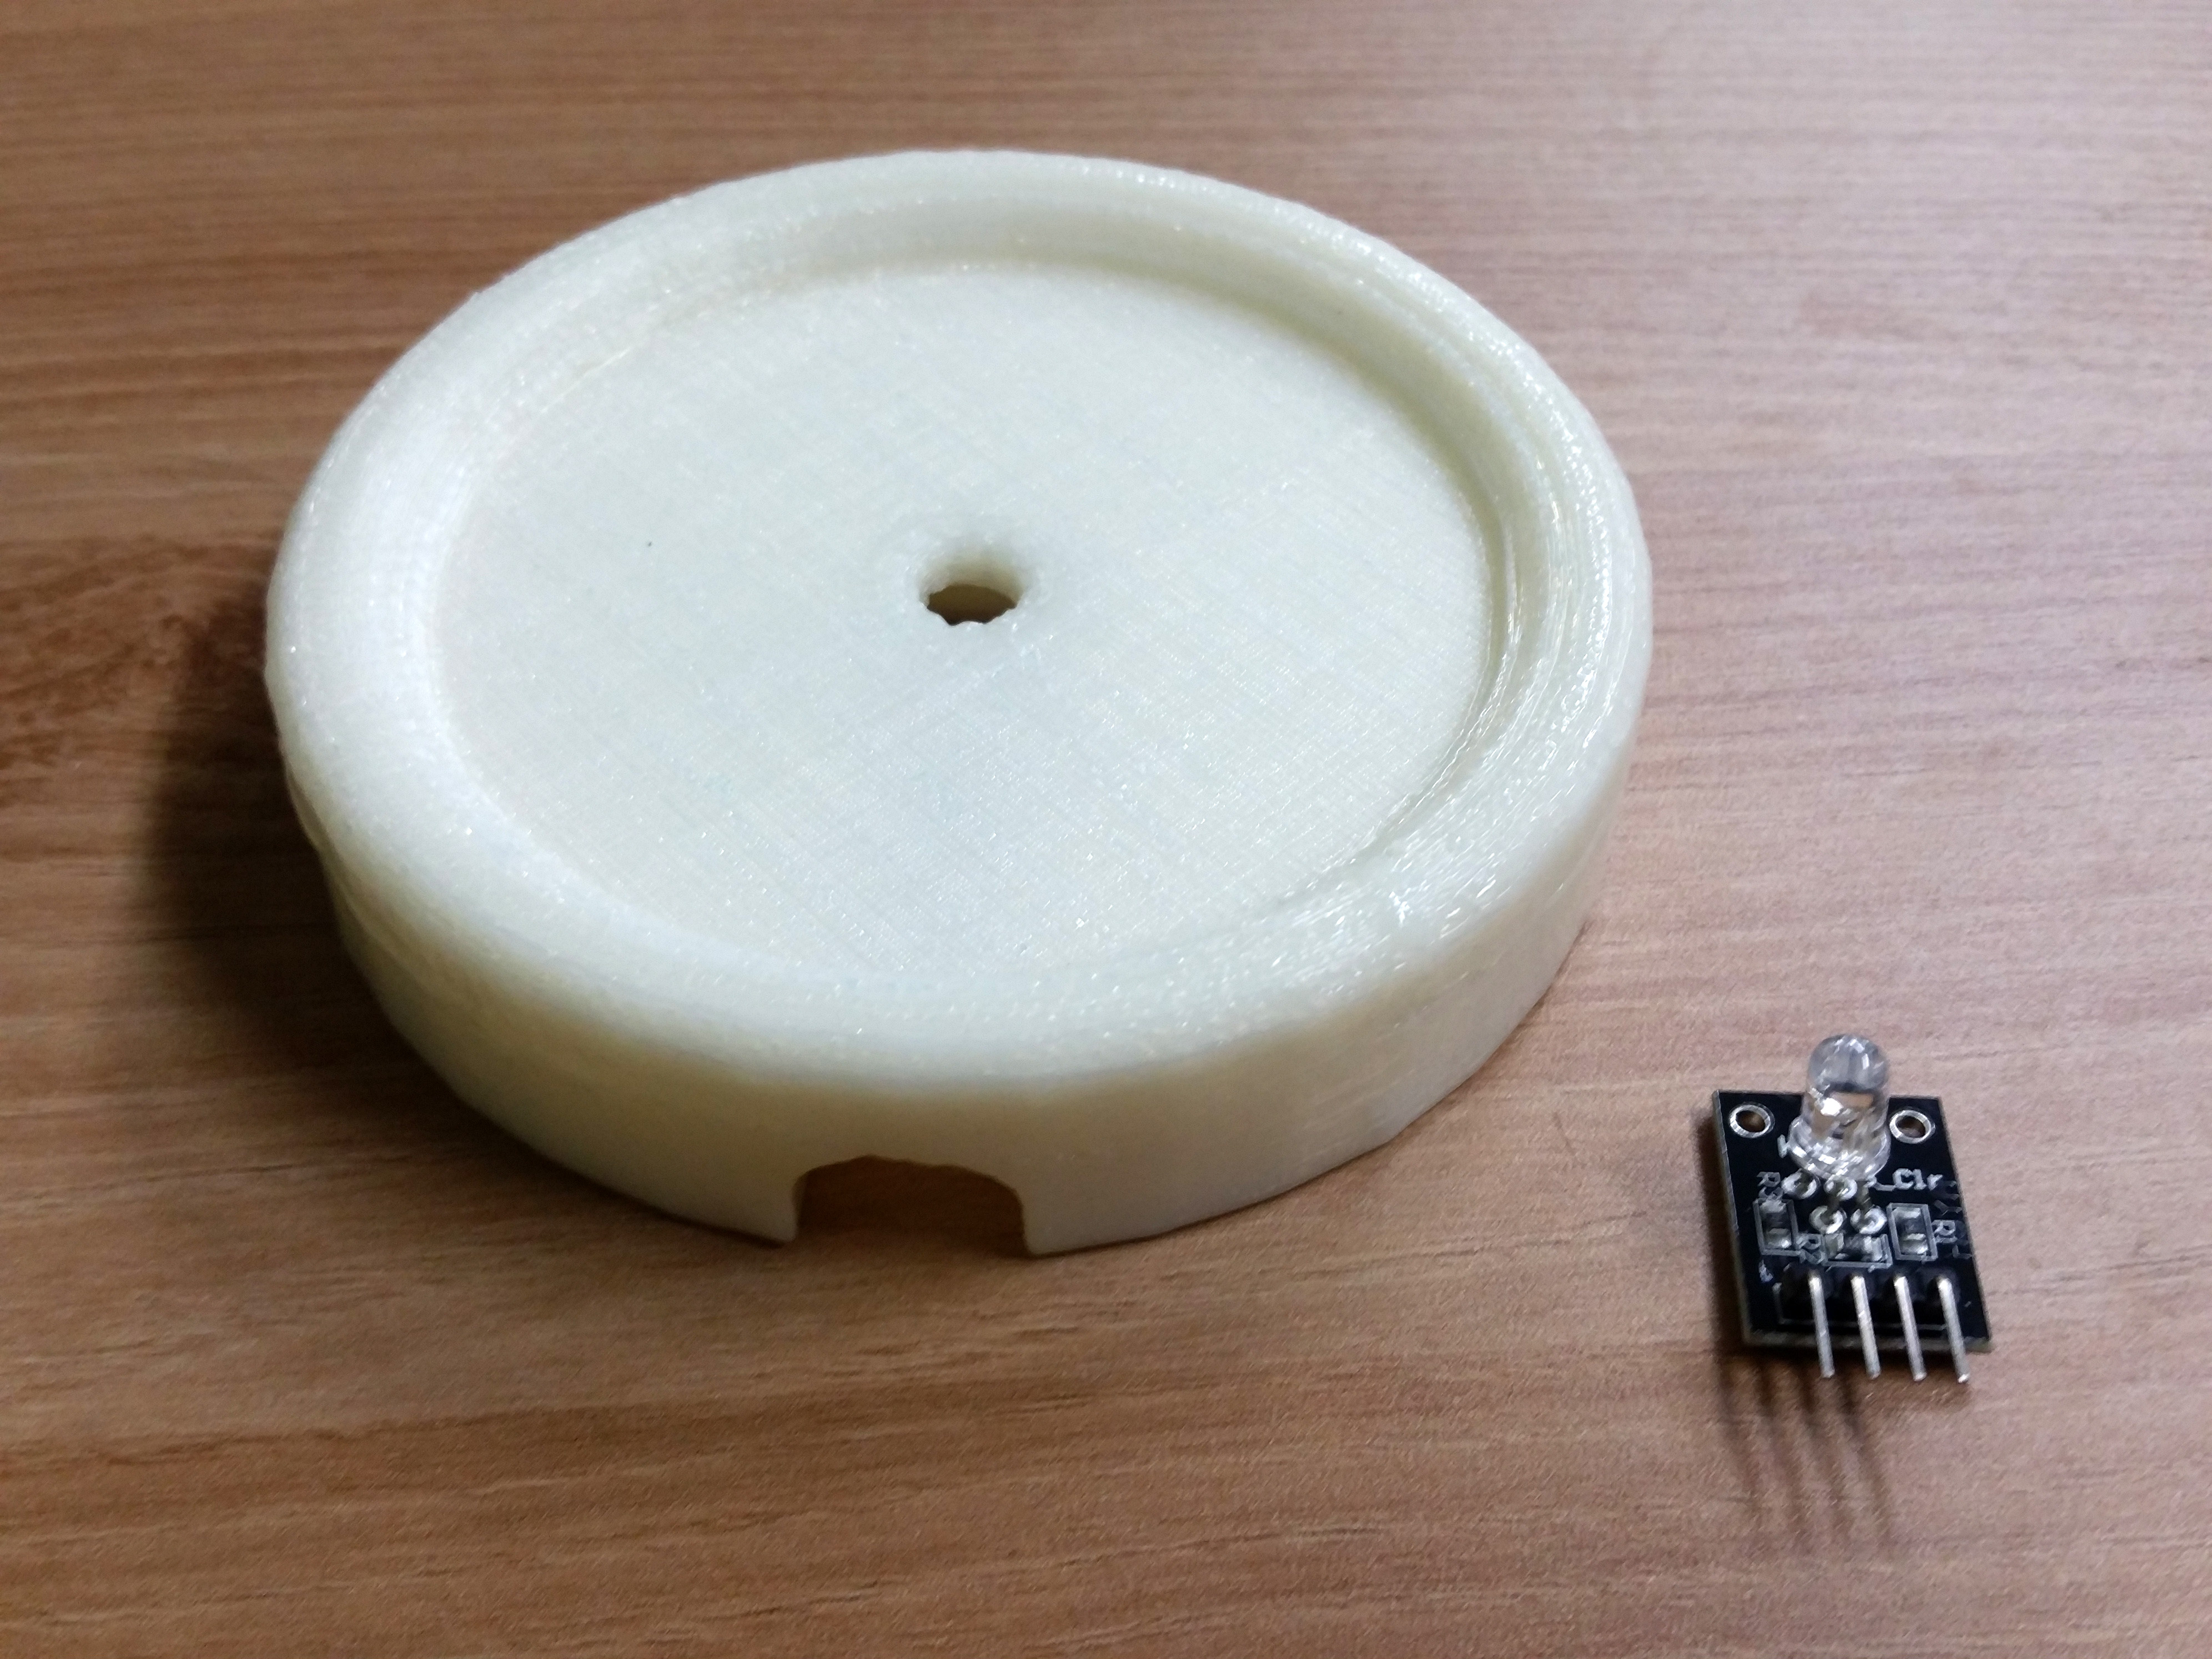 20141015_181938.jpg Download free STL file RGB LED Coaster • 3D printing object, Glutnard